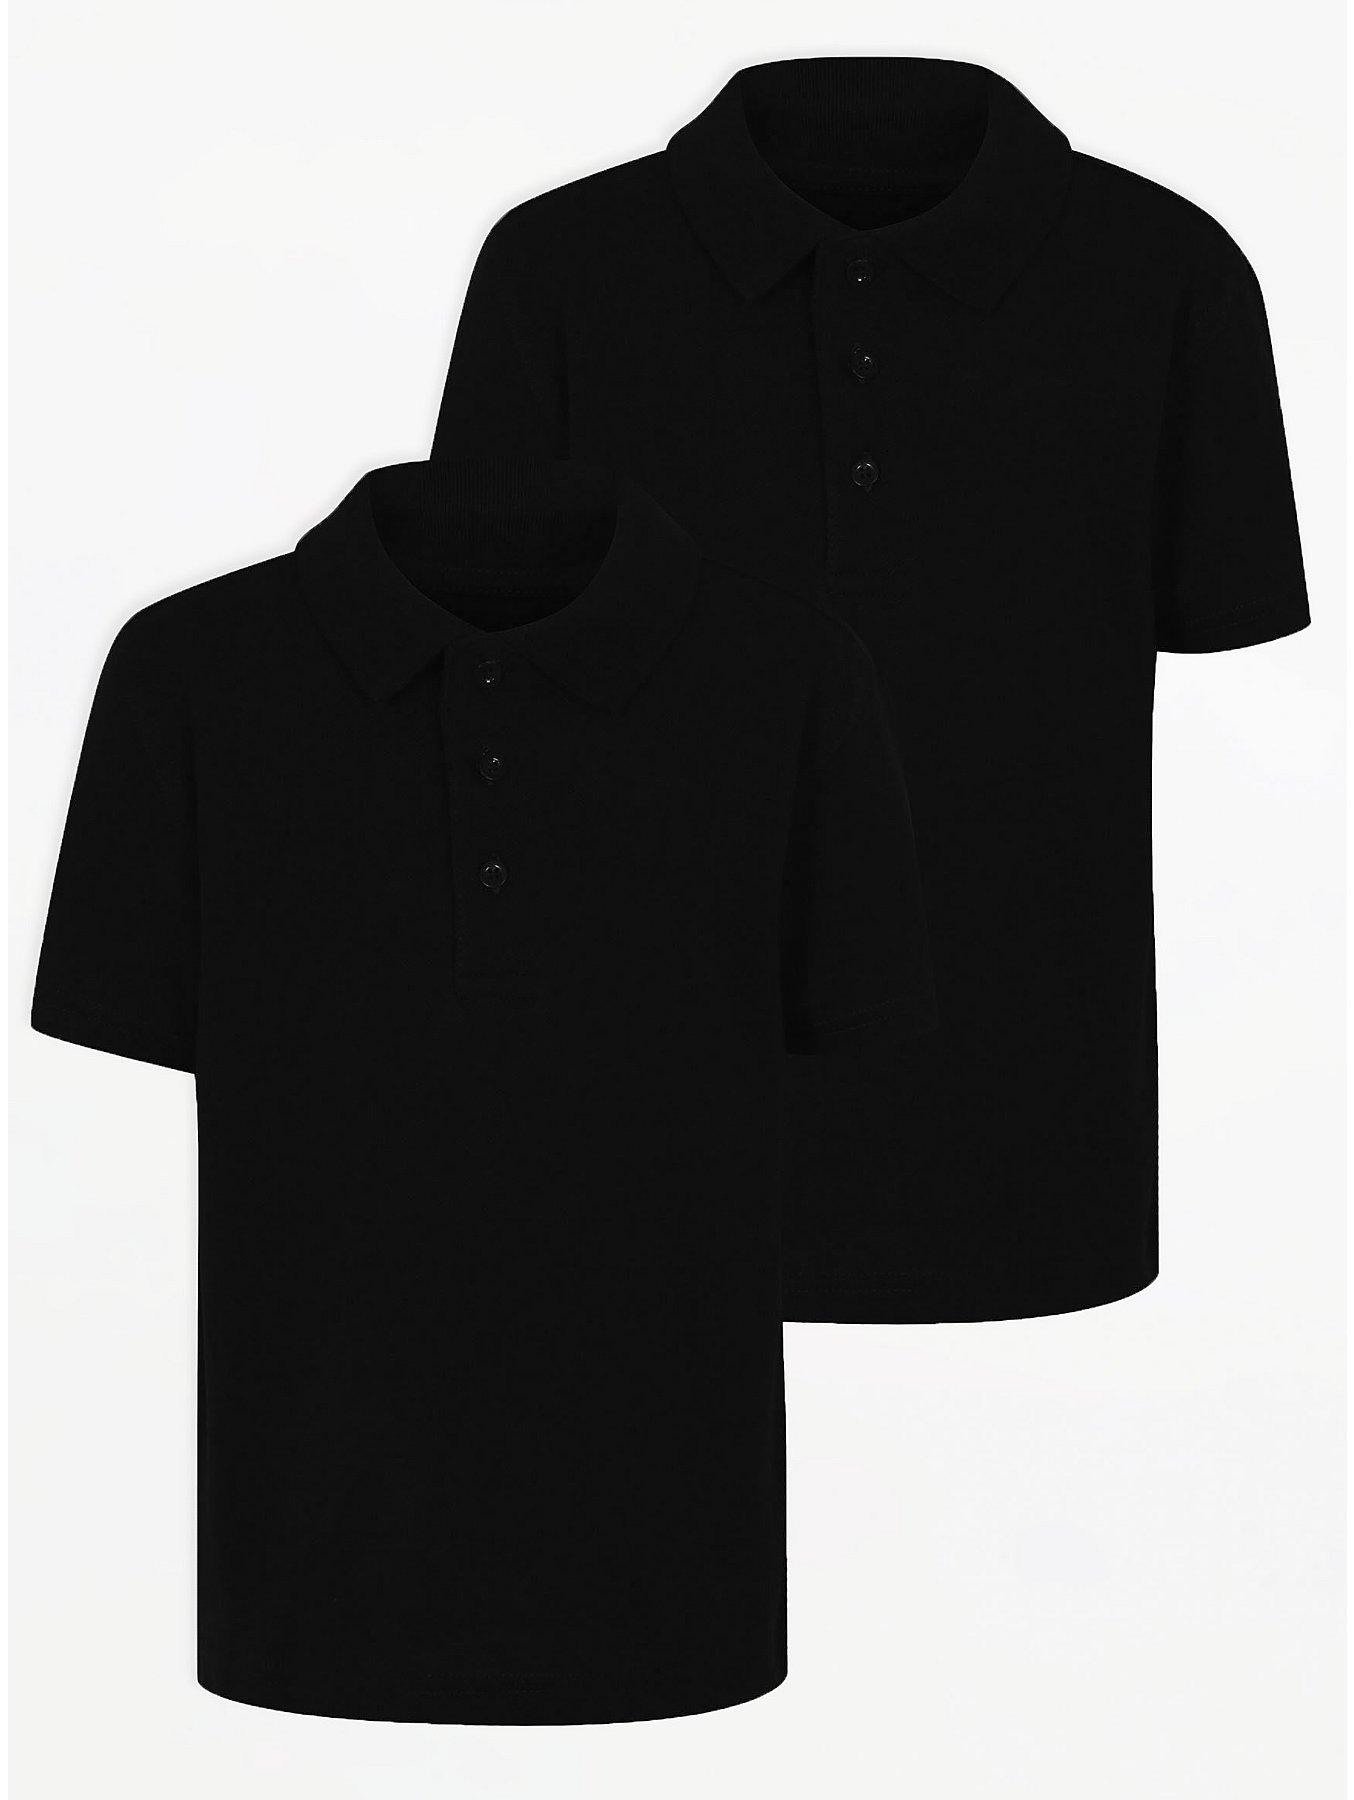 067c58b35 Boys School 2 Pack Polo Shirts – Black | School | George at ASDA